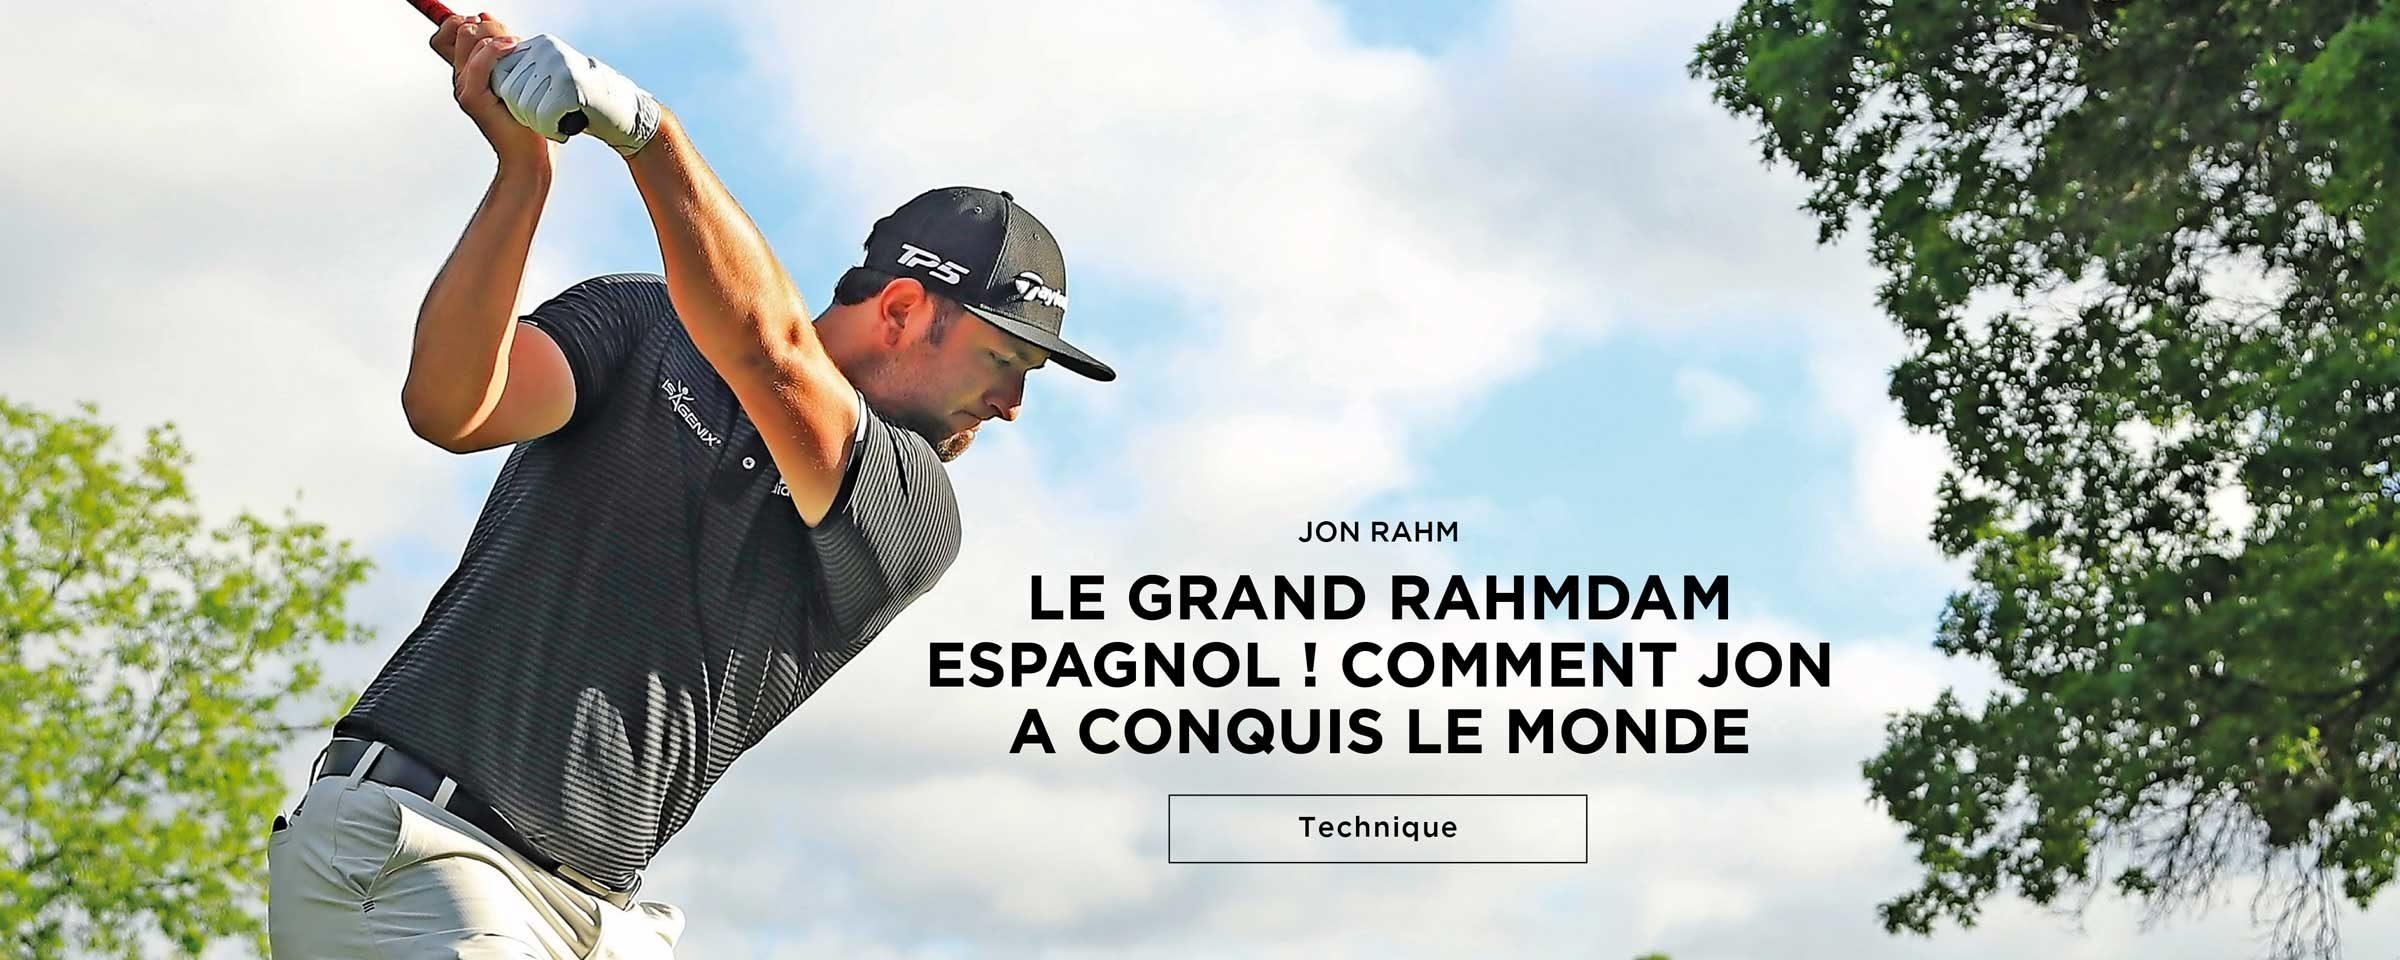 Jon Rahm – Technique